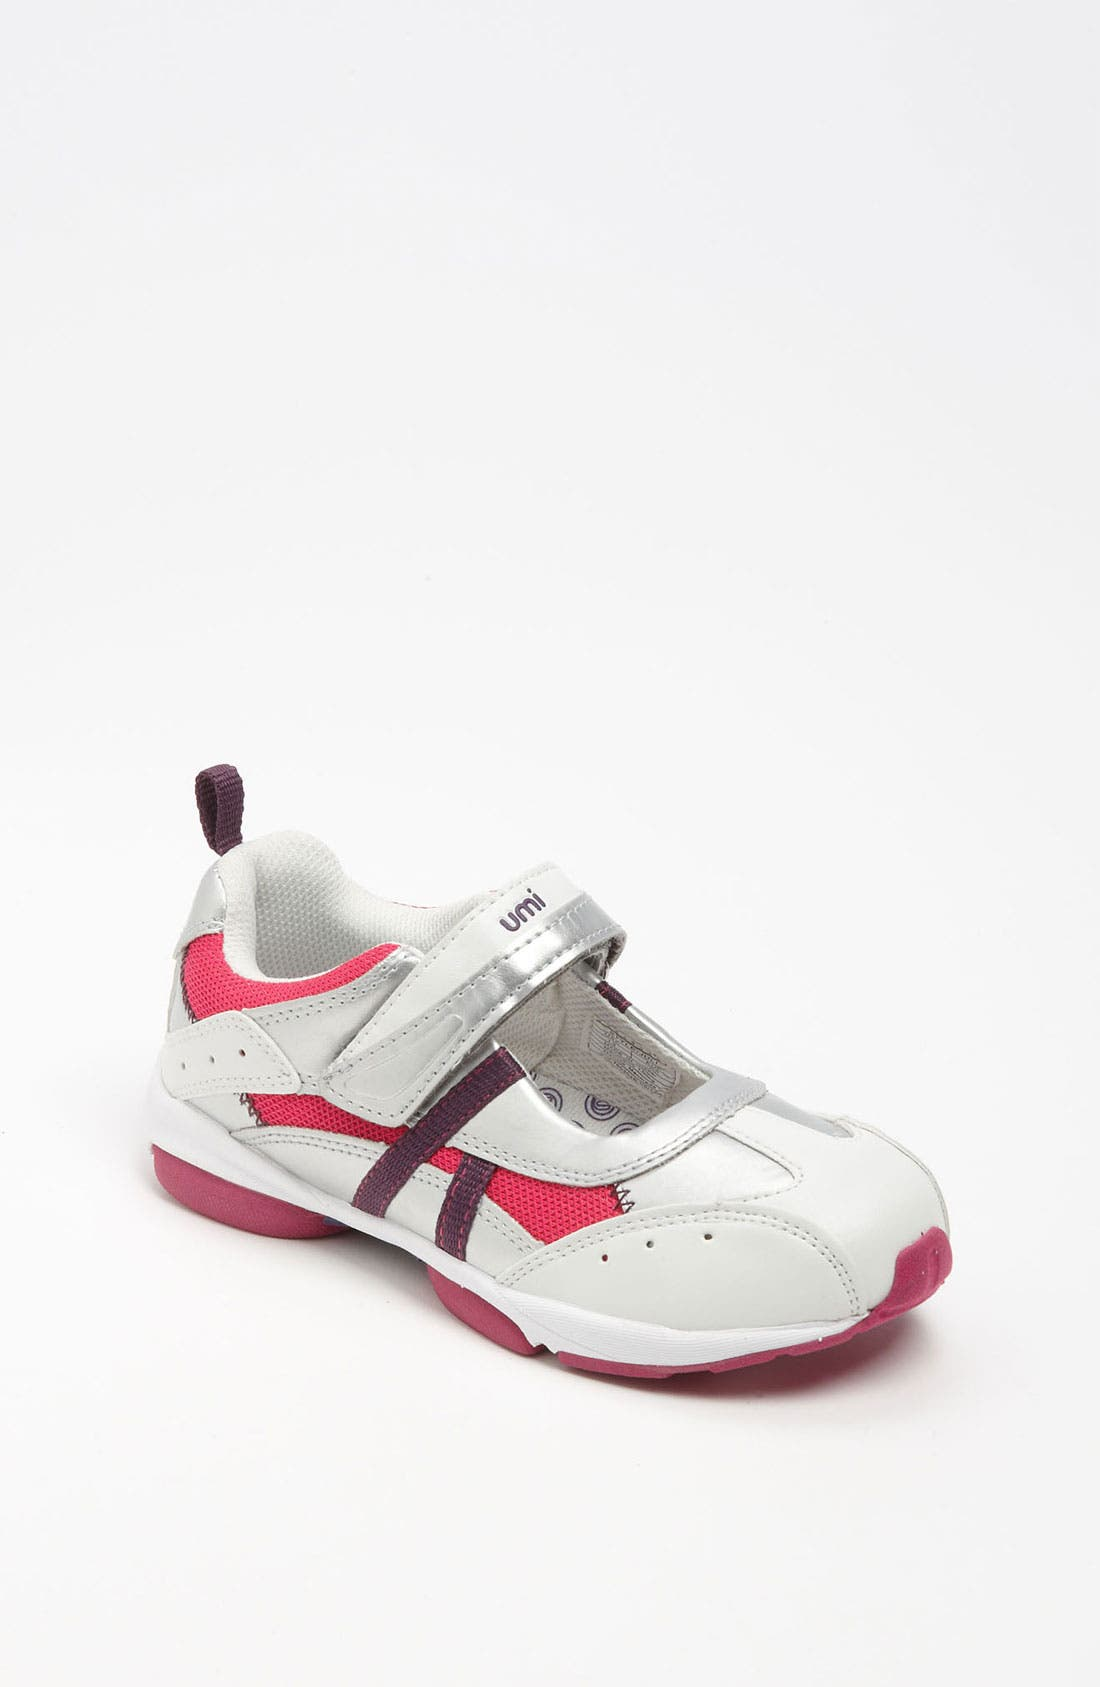 Alternate Image 1 Selected - Umi 'Juli' Sneaker (Toddler, Little Kid & Big Kid)